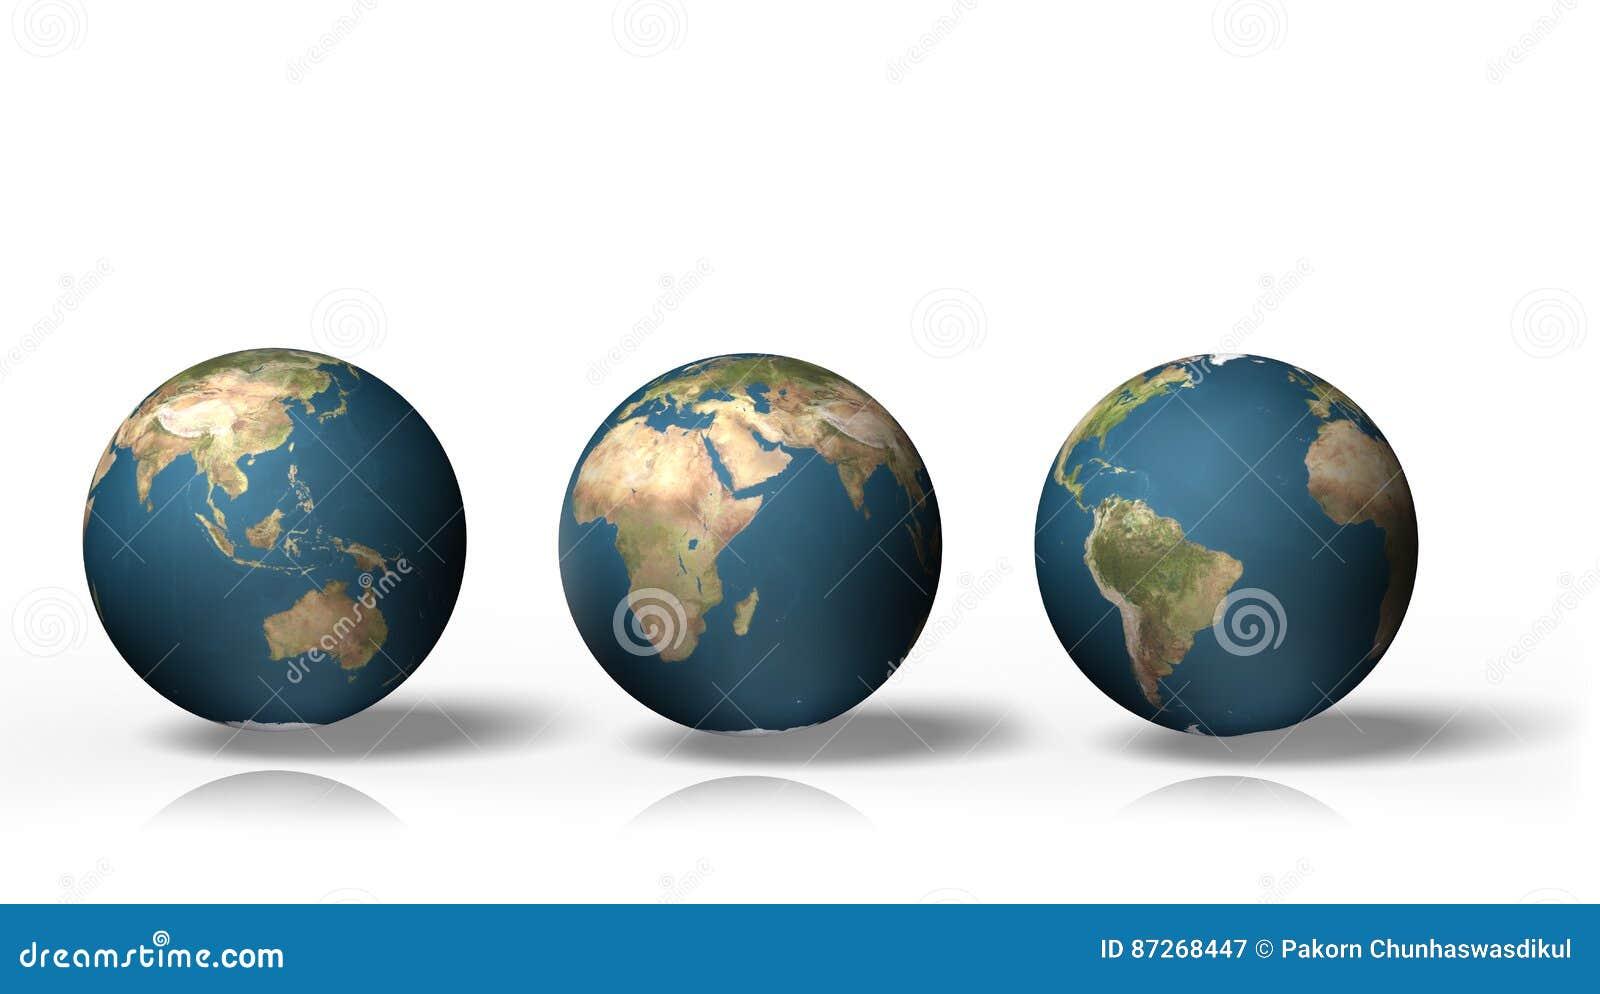 Globo 3D que mostra a terra com todos os continentes, isolados no fundo branco